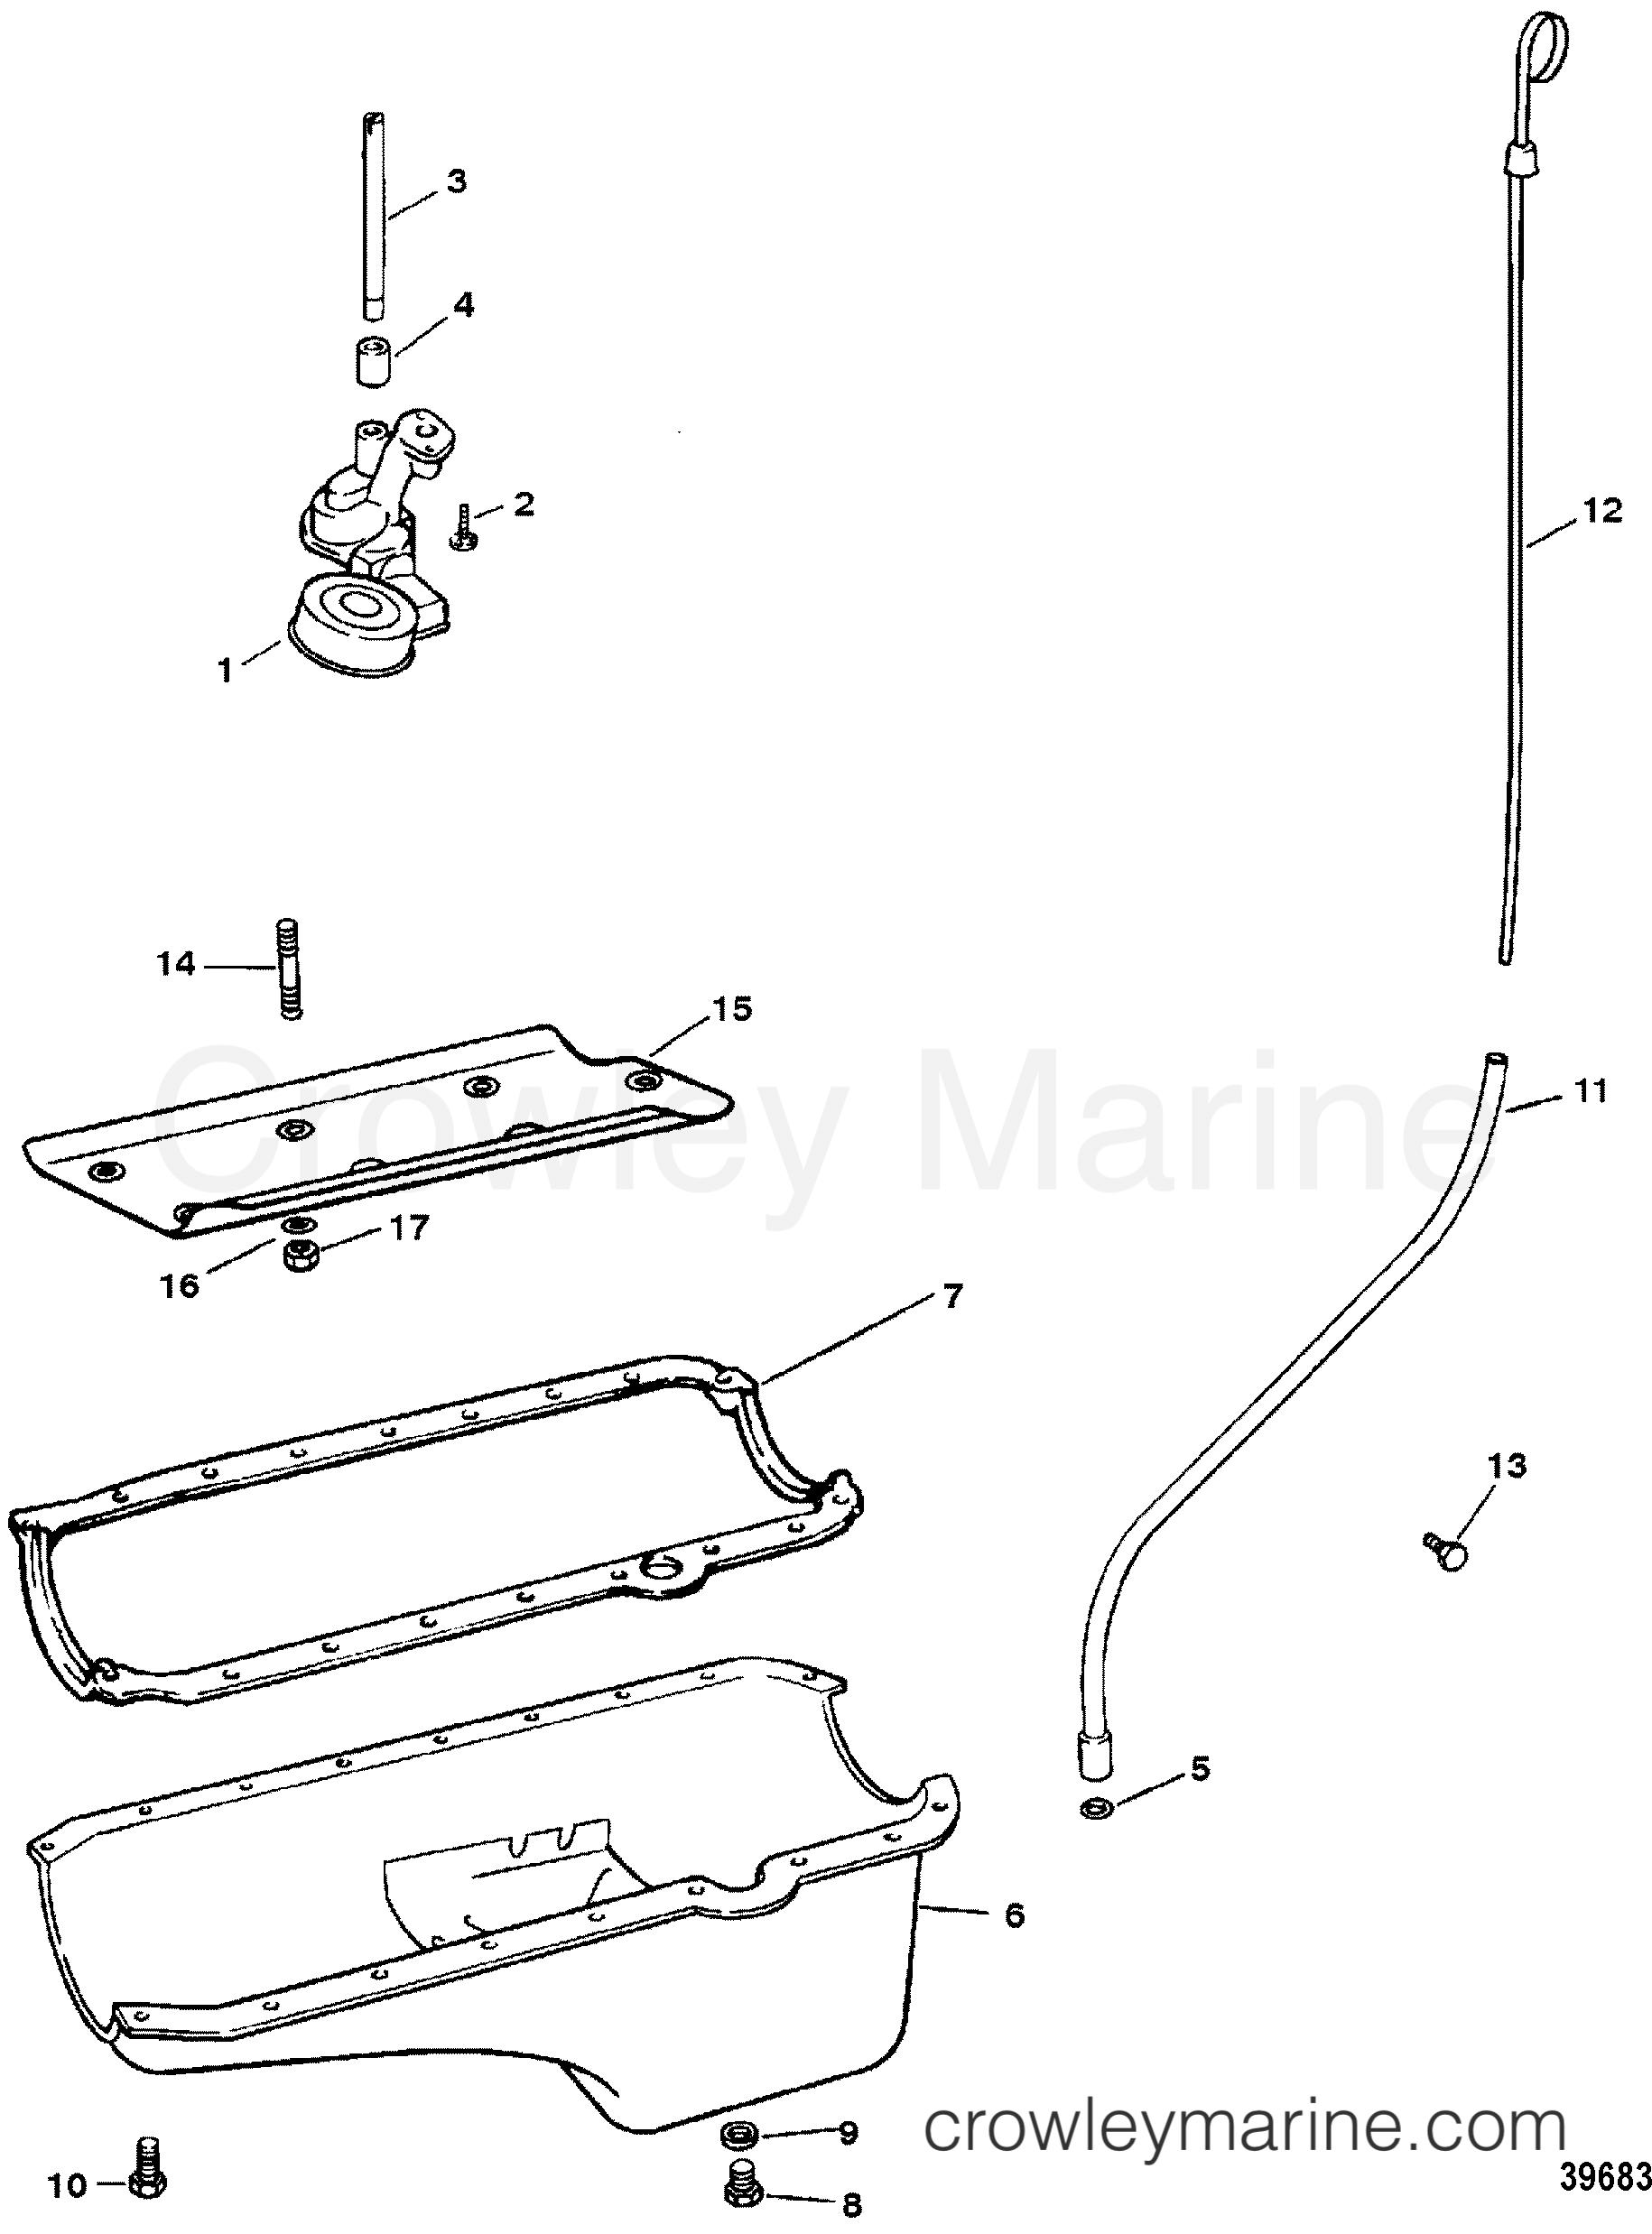 1993 Mercruiser 502EFI [BRAVO] - 4502111FE - OIL PAN AND OIL PUMP section